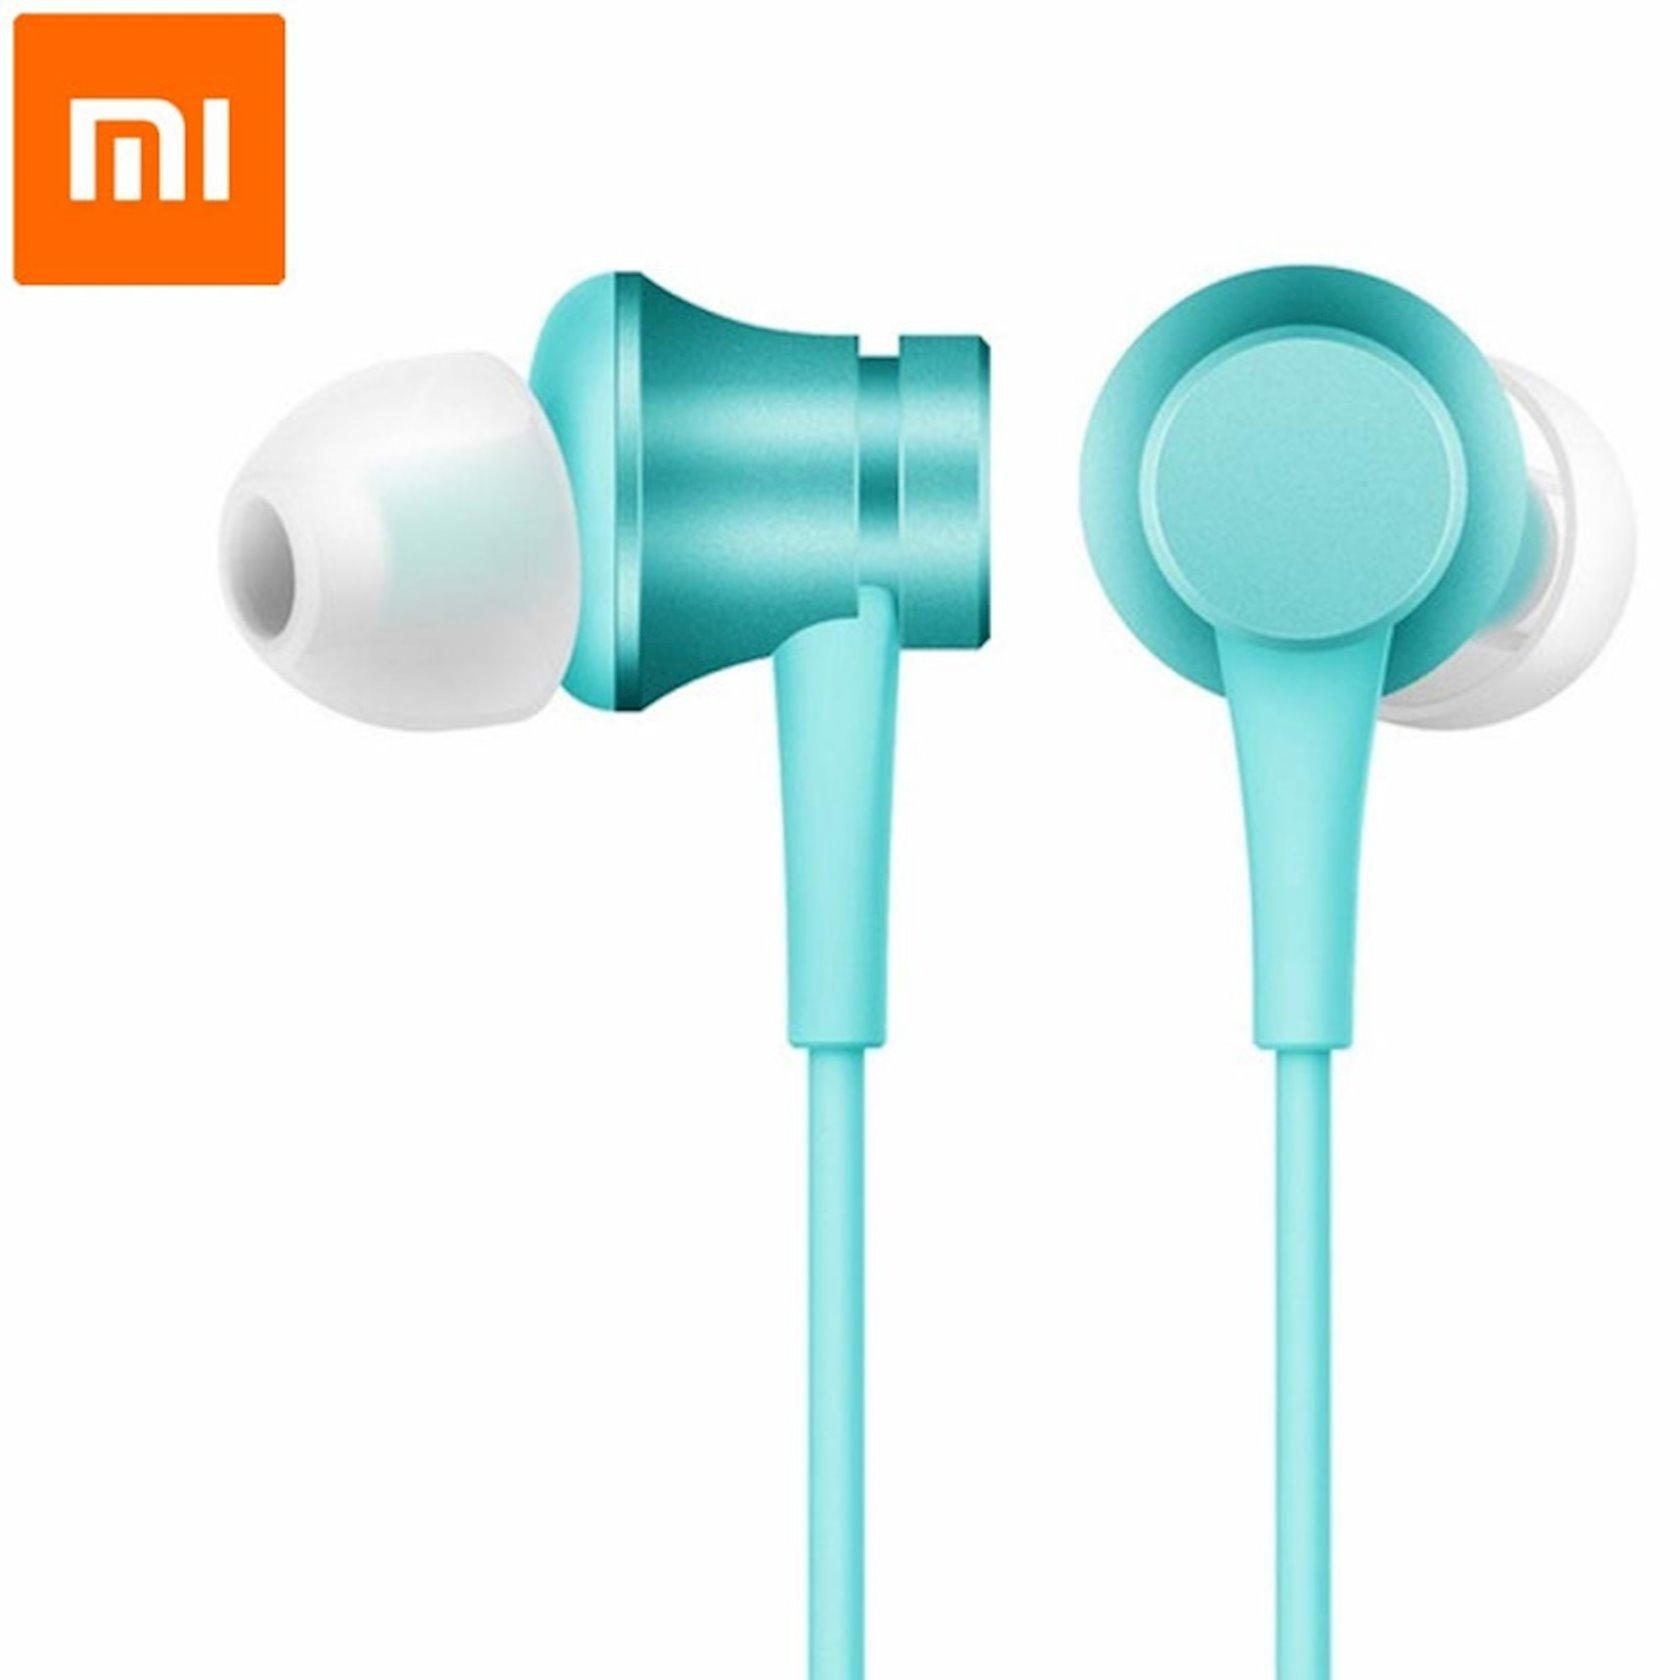 Simli qulaqlıqlar Xiaomi Mi In-Ear Basic ZBW4358TY Blue